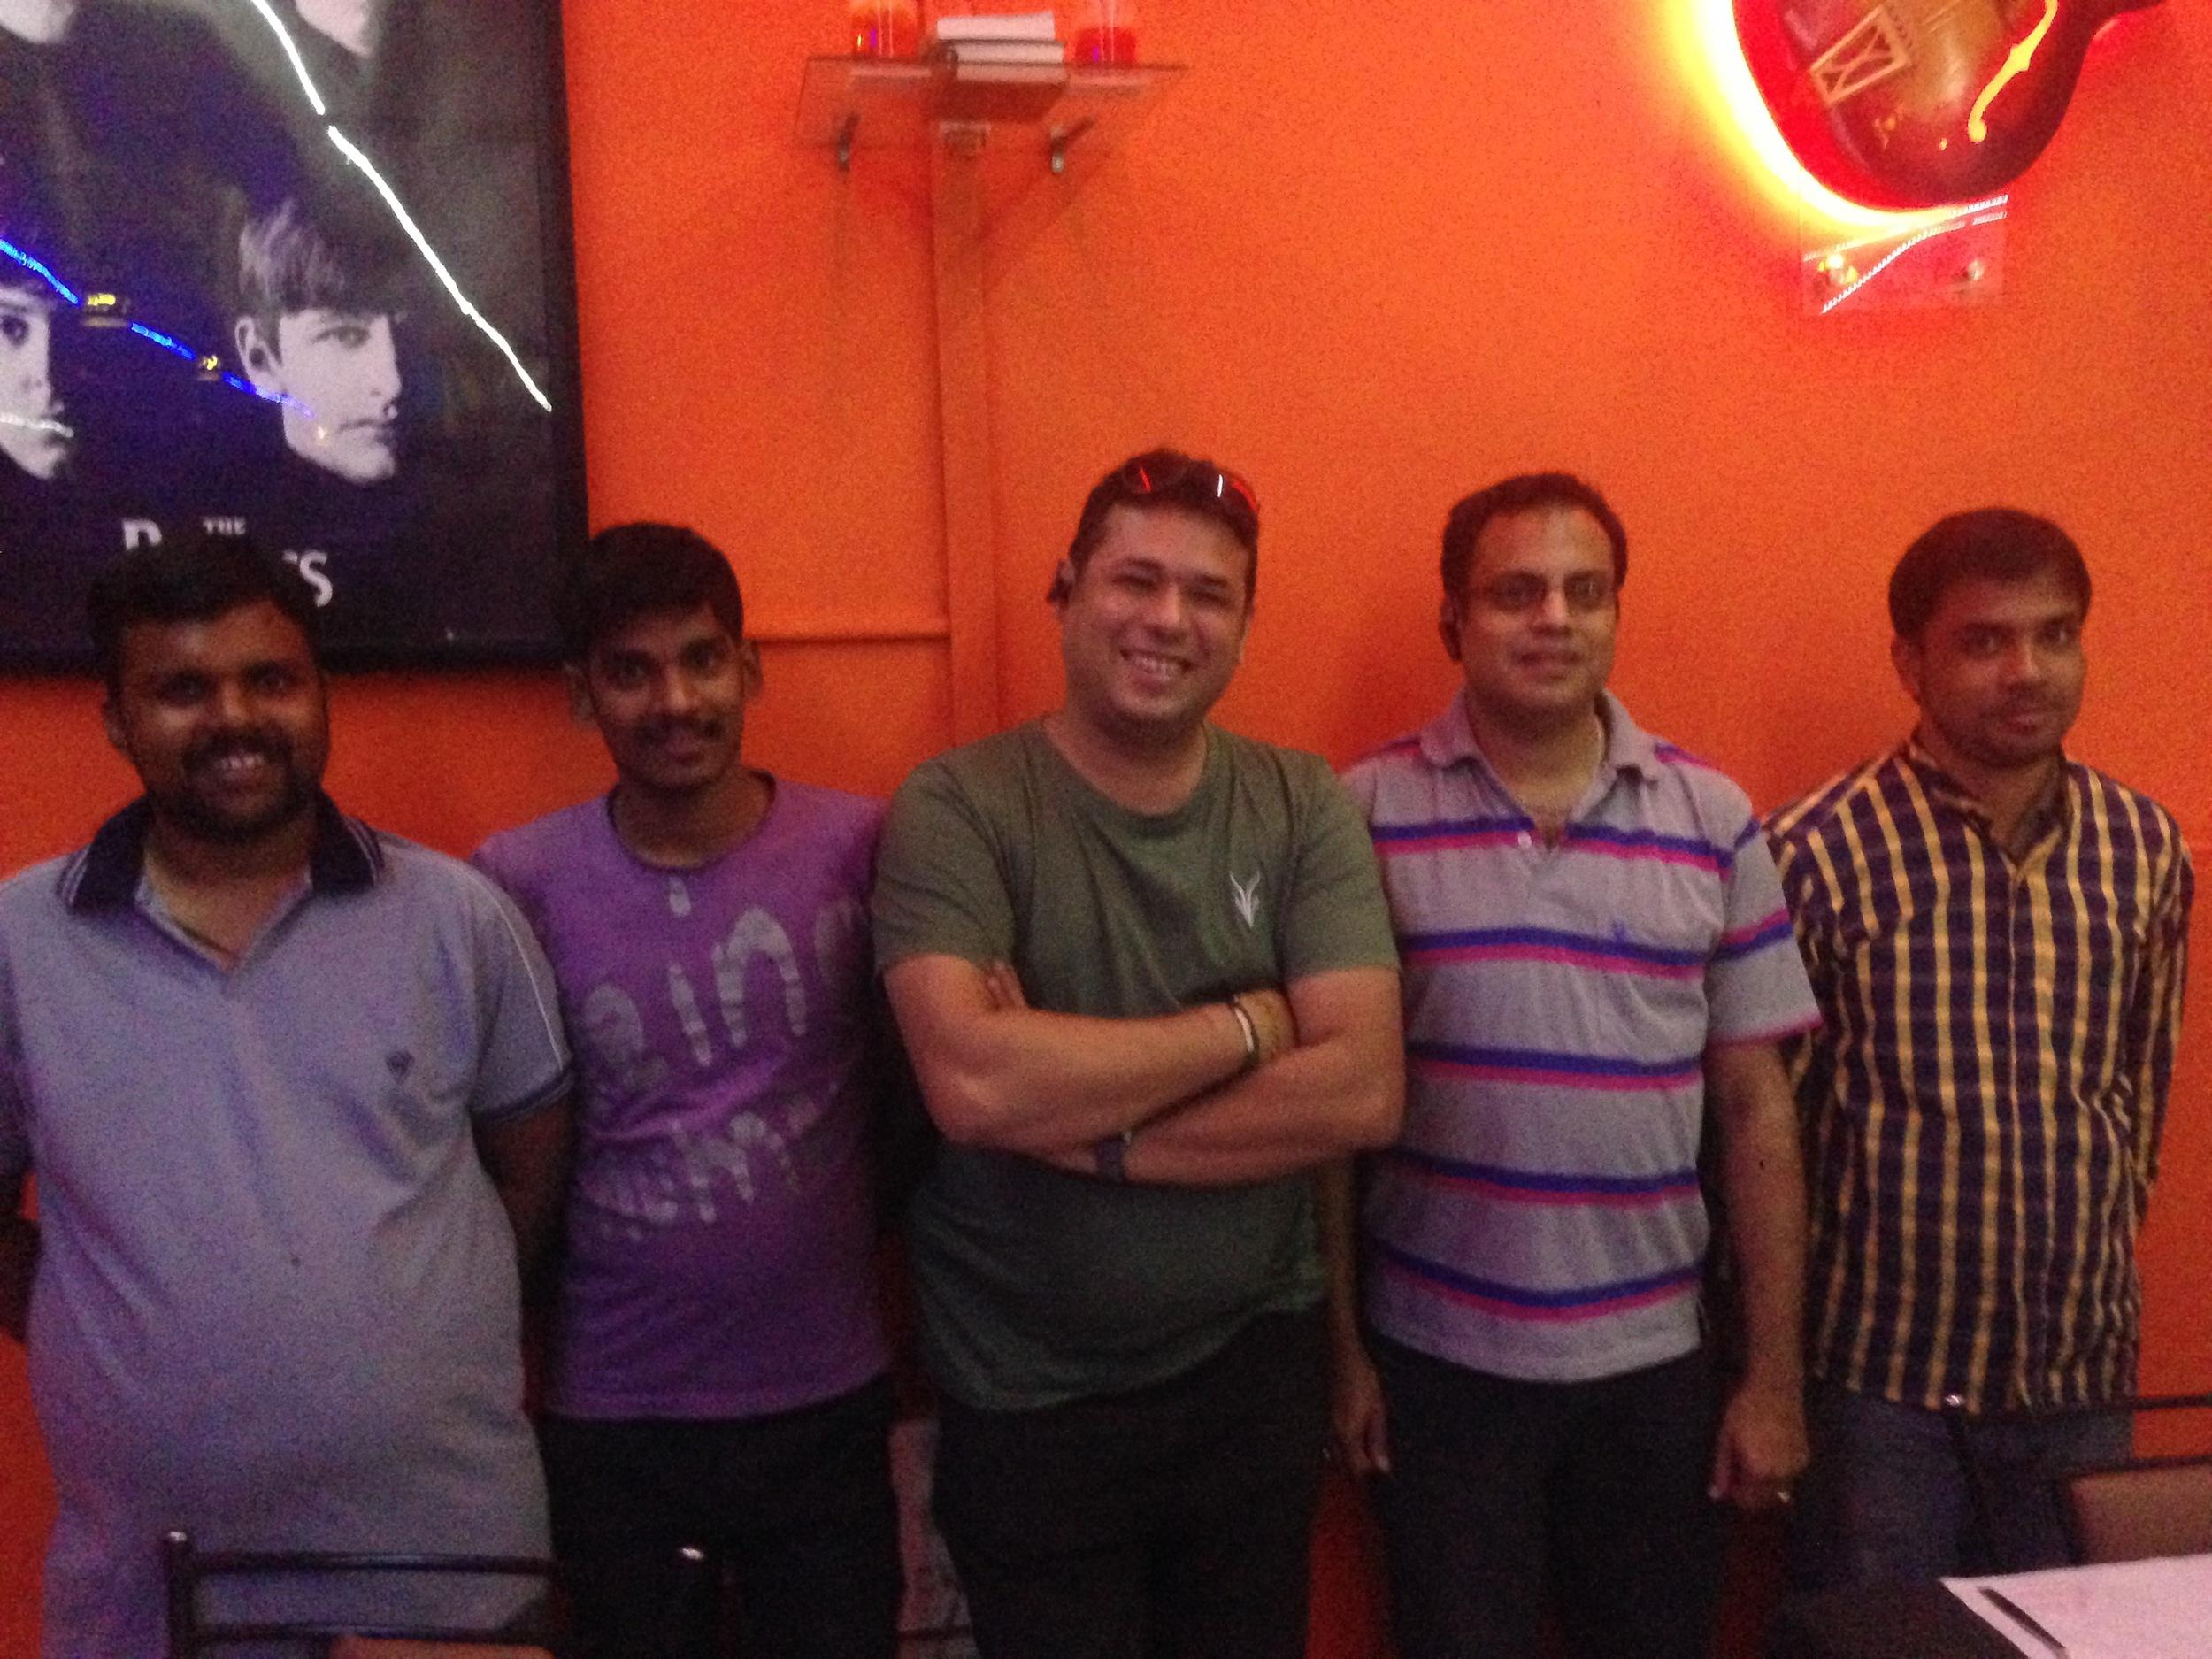 The restaurant crew: Antony, Suresh, Dom, Eric, and Sanjit.